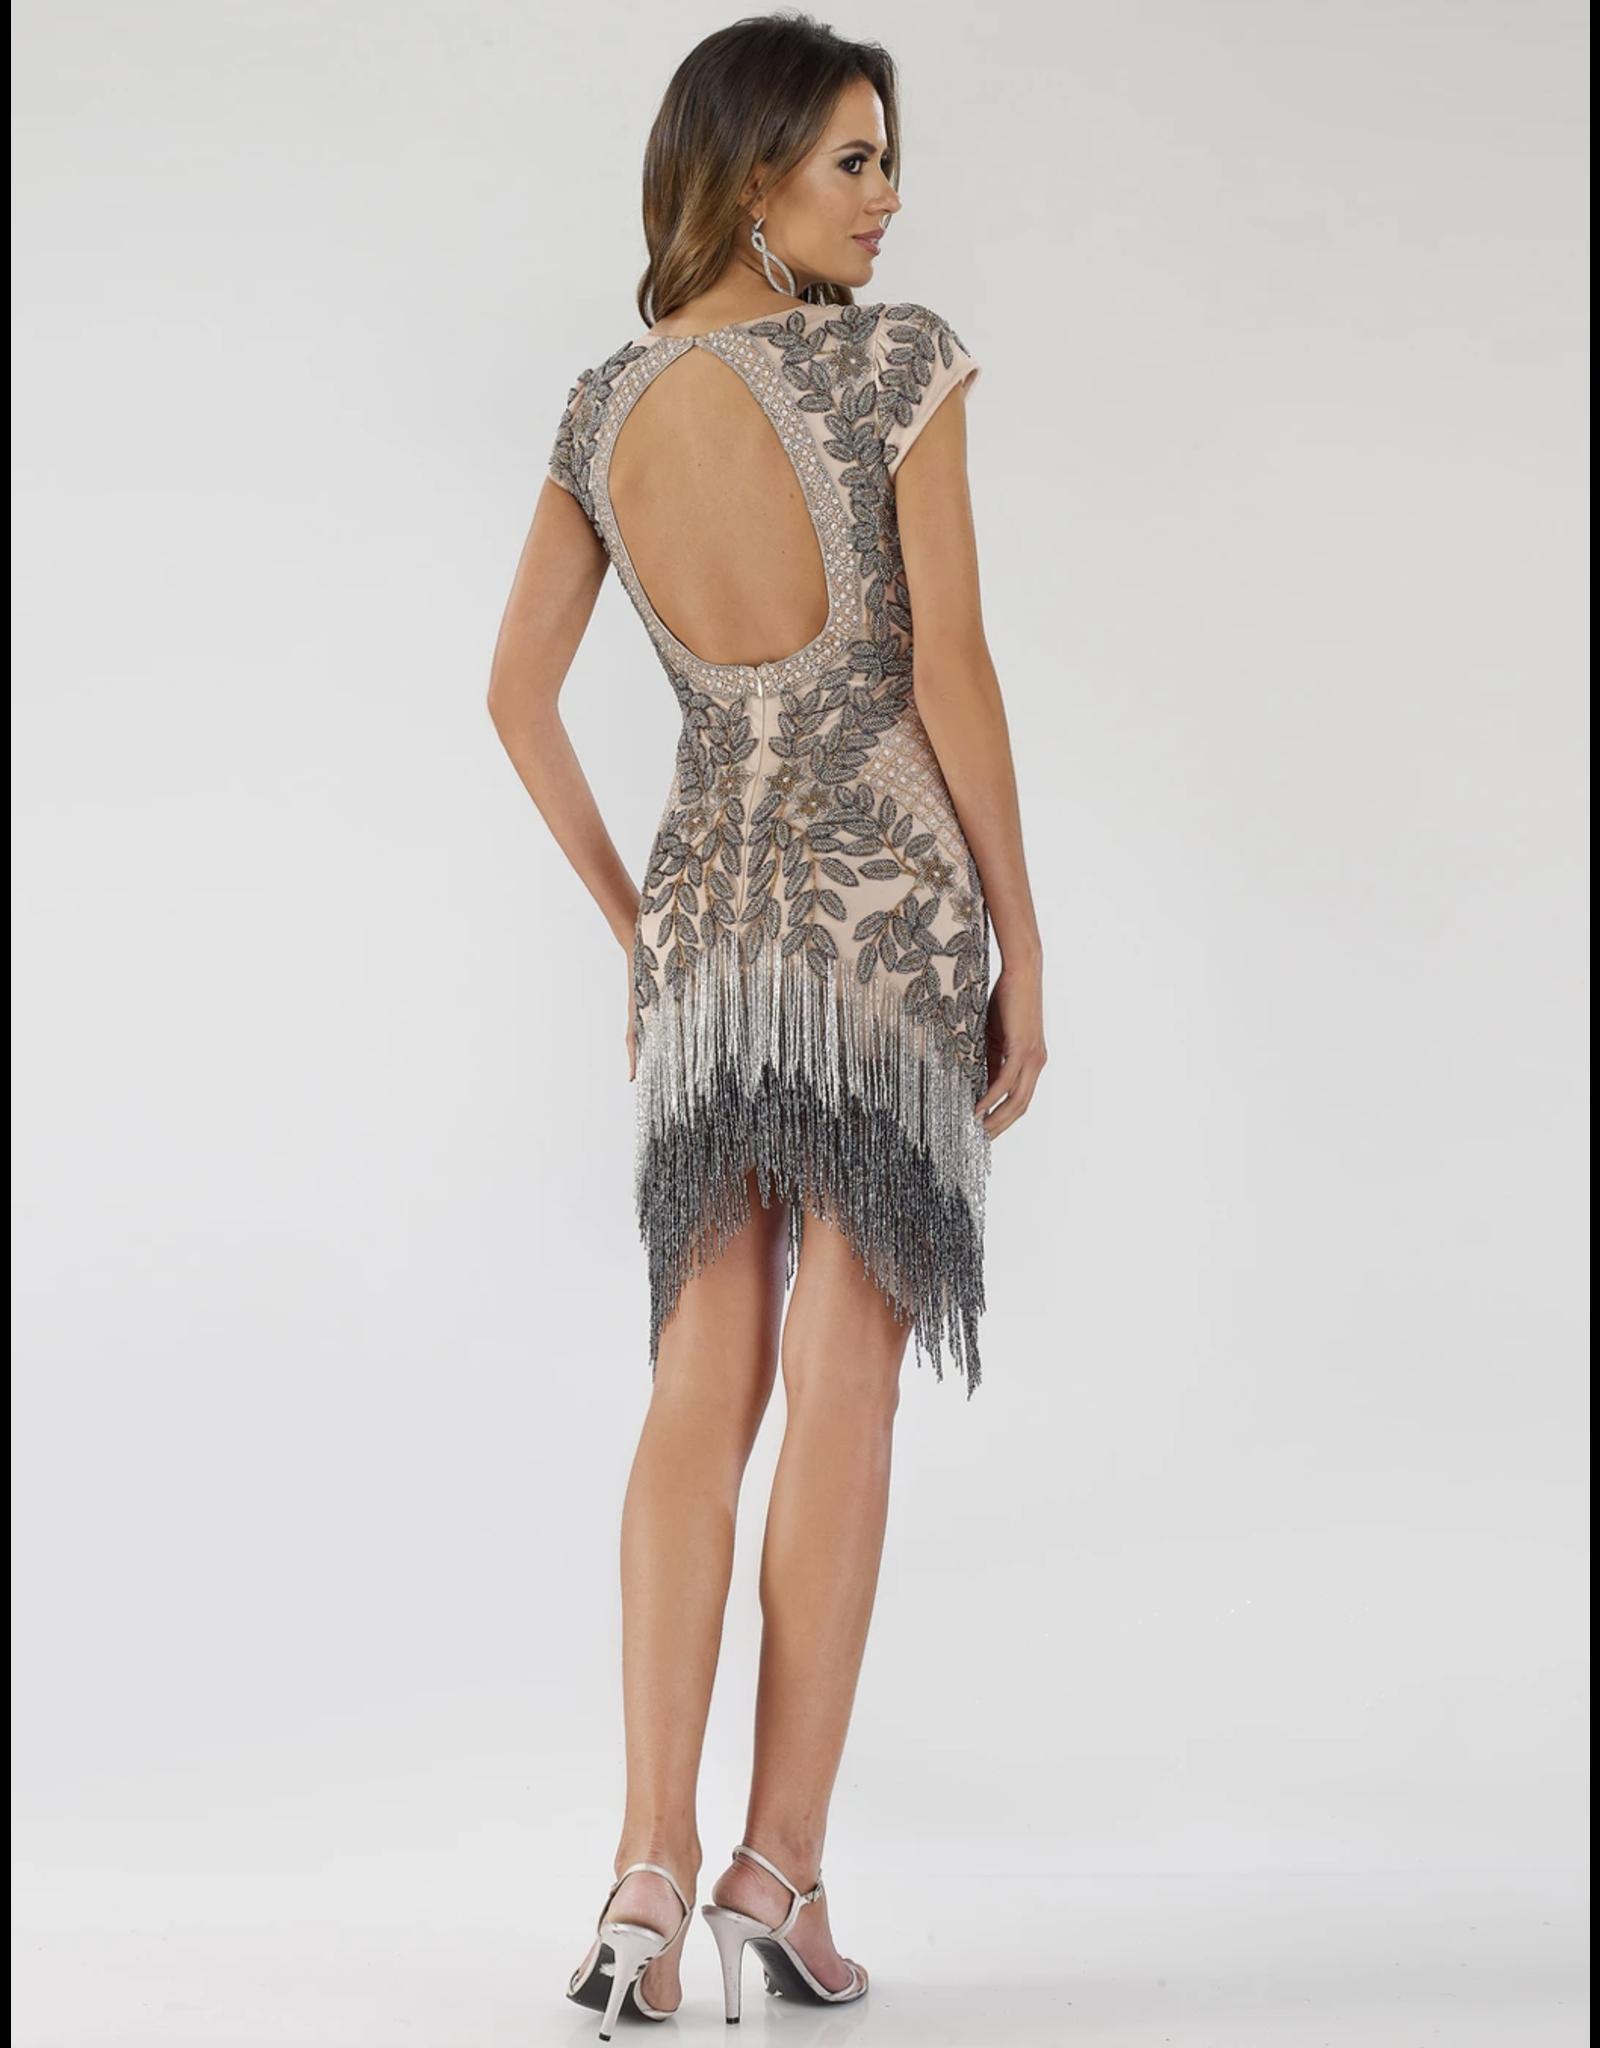 Lara 29609 Lara Dresses